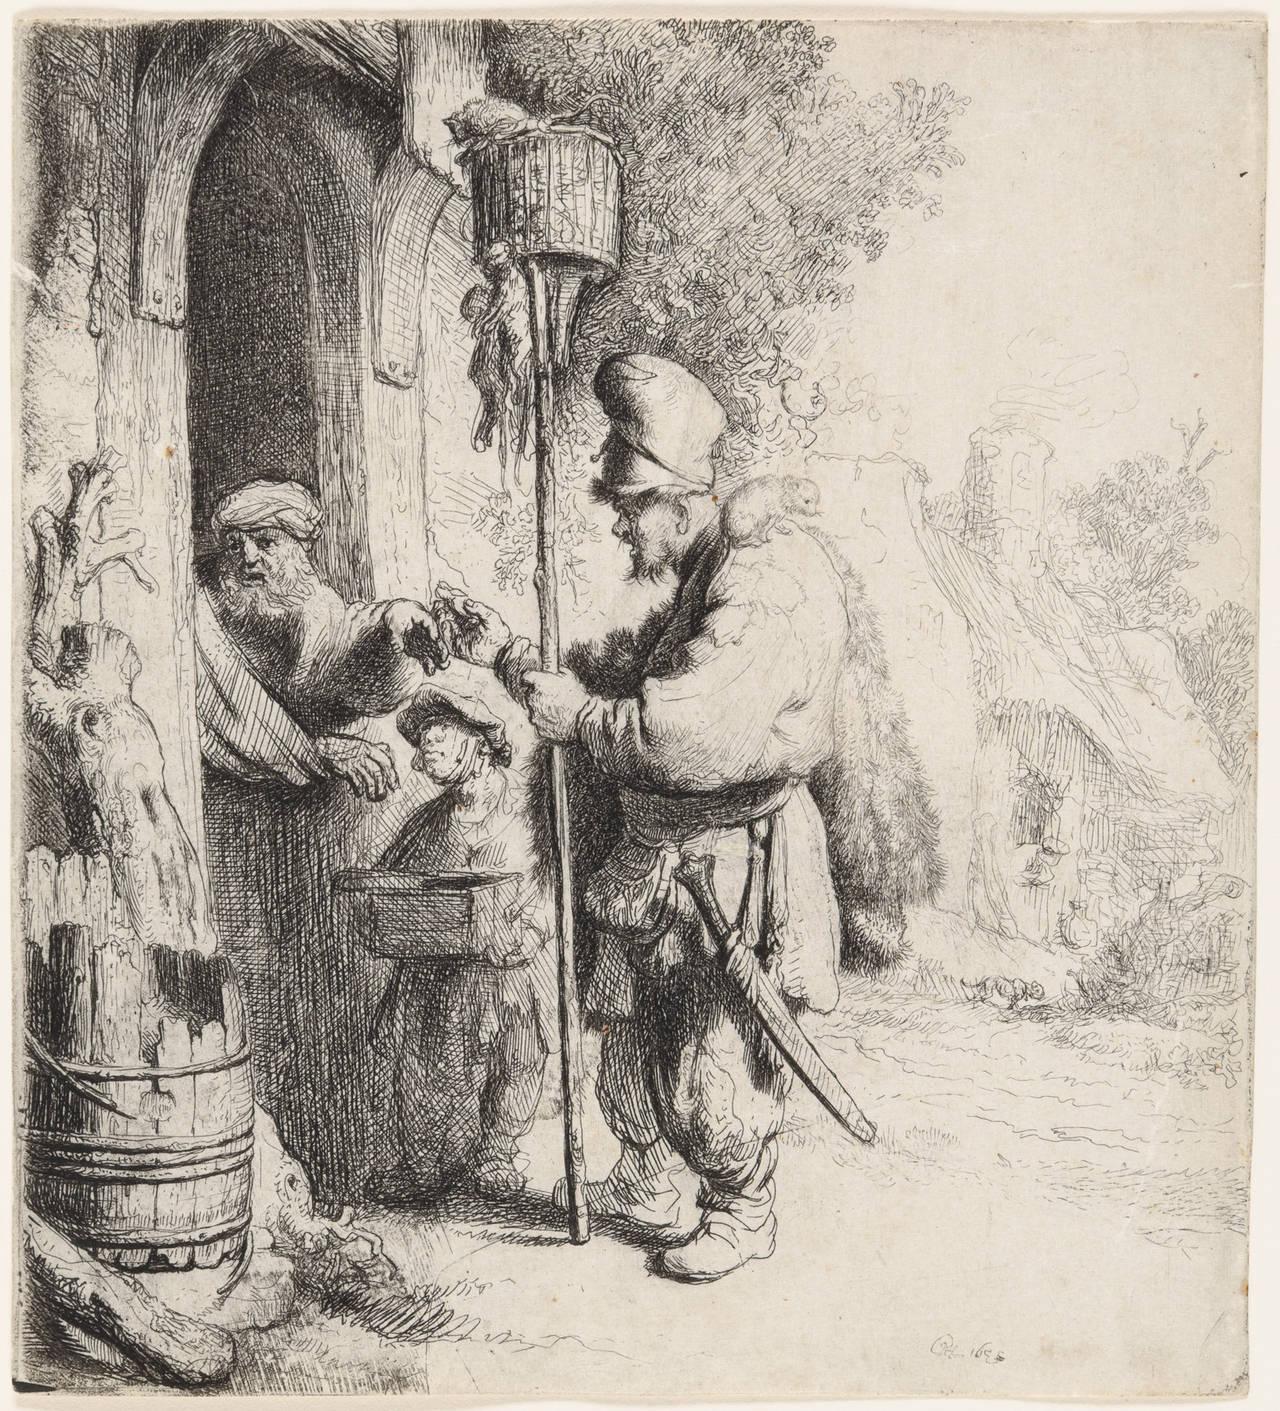 The Rat Catcher (The Rat Poison Peddler)